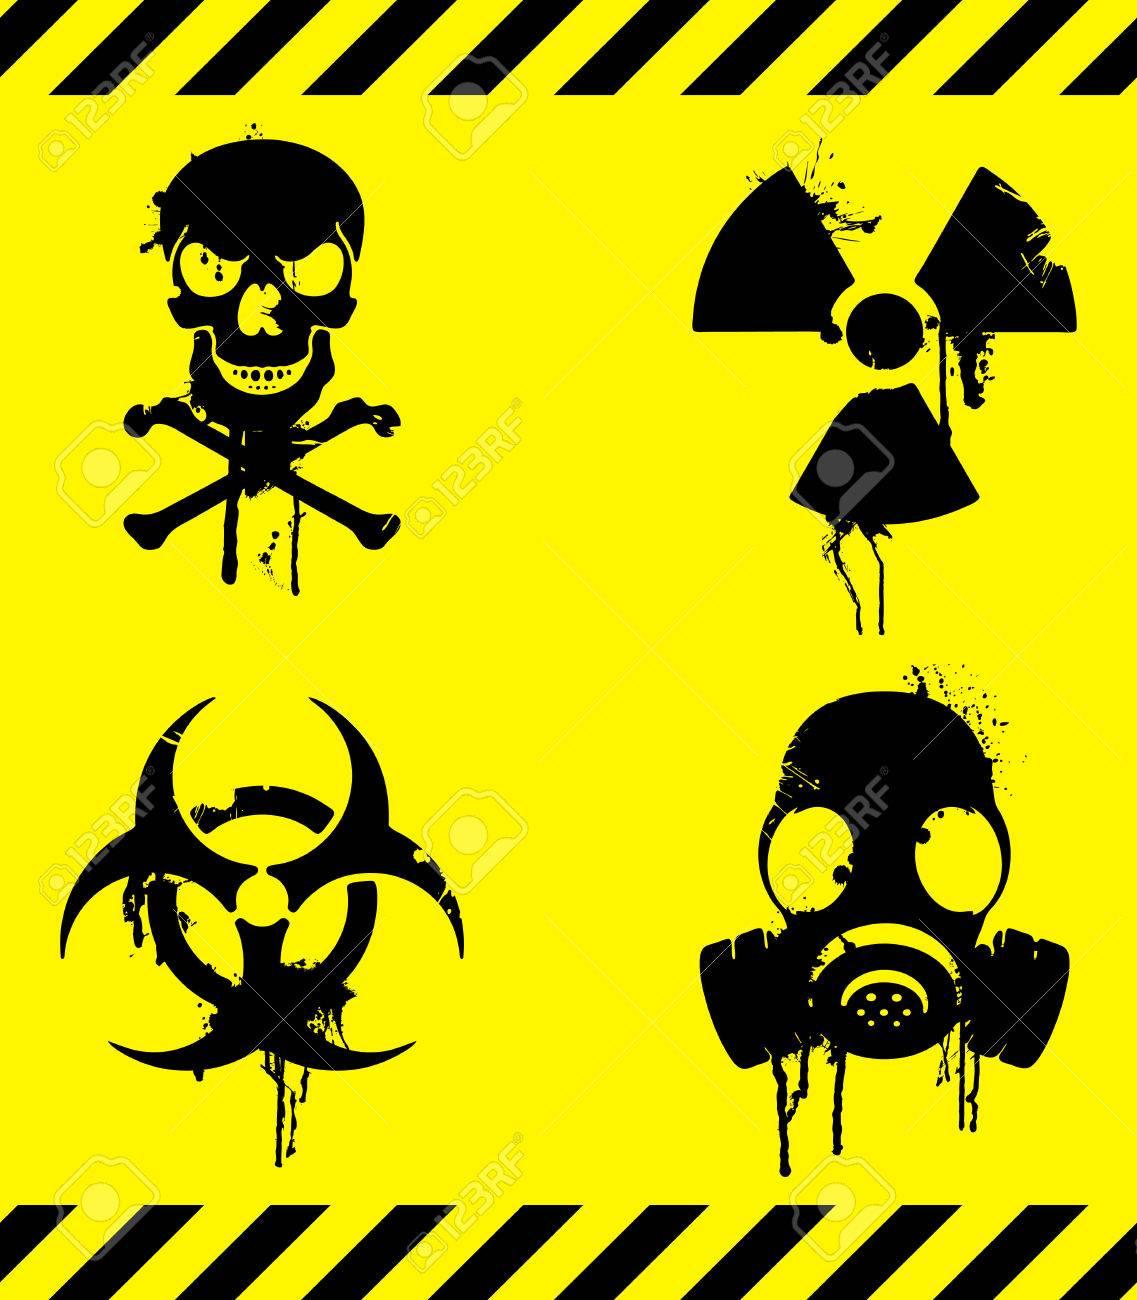 Warning signs. Stock Vector - 6658274